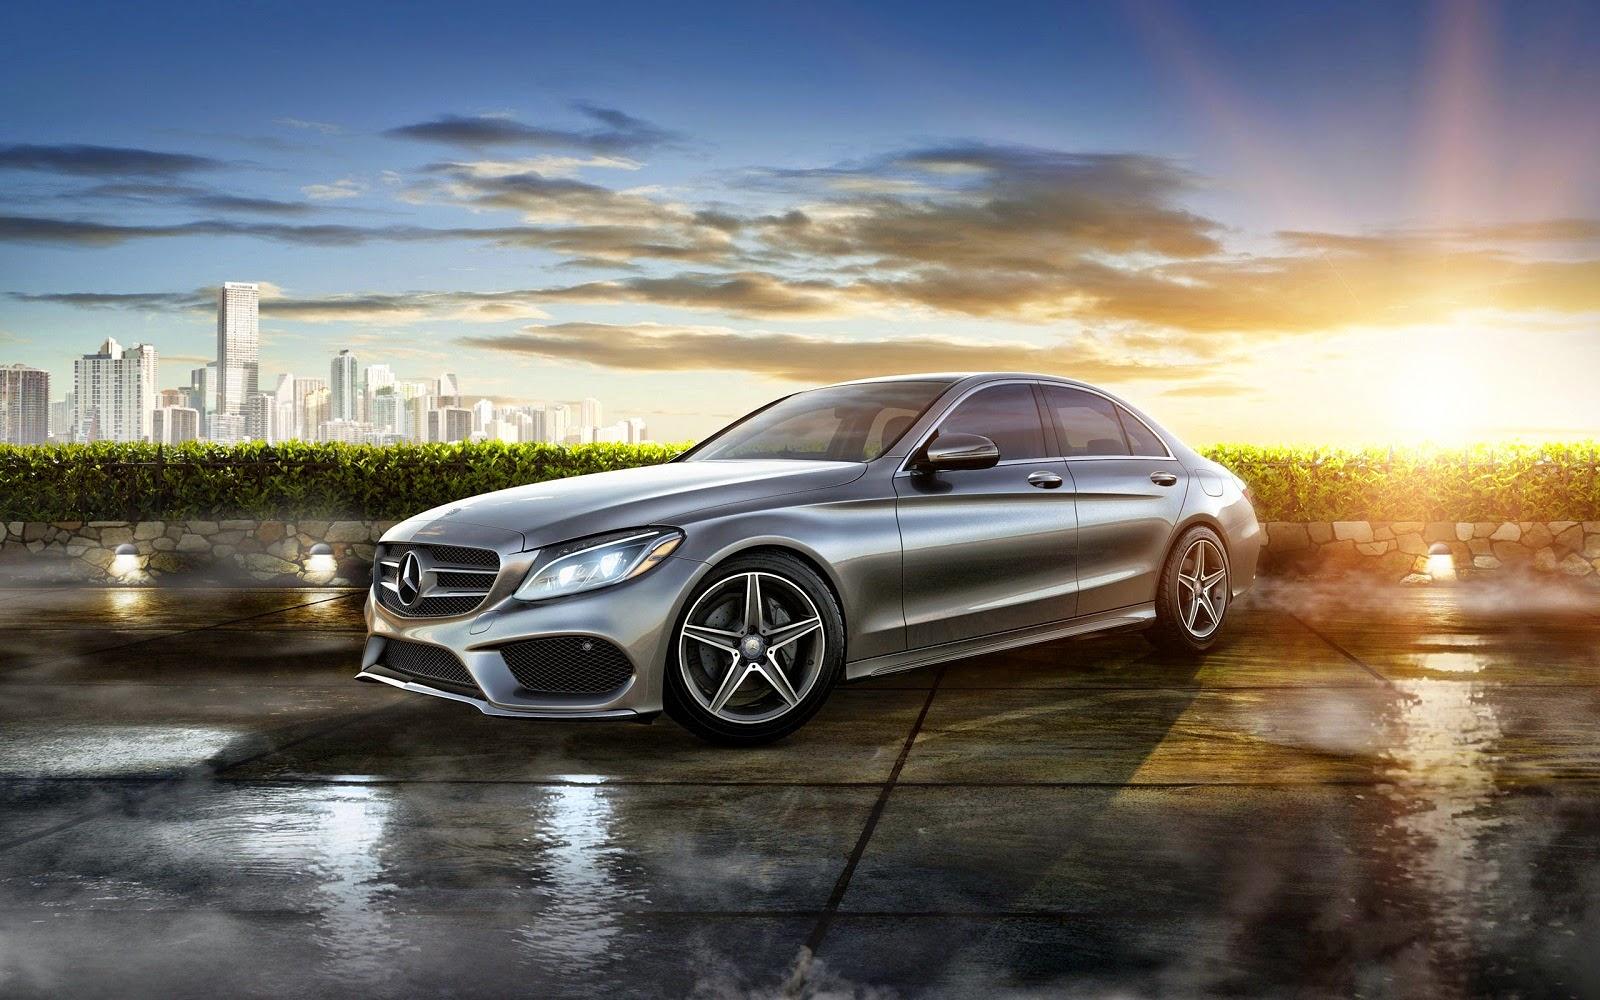 Msrp c400 2015 2017 2018 best cars reviews for Mercedes benz c300 msrp